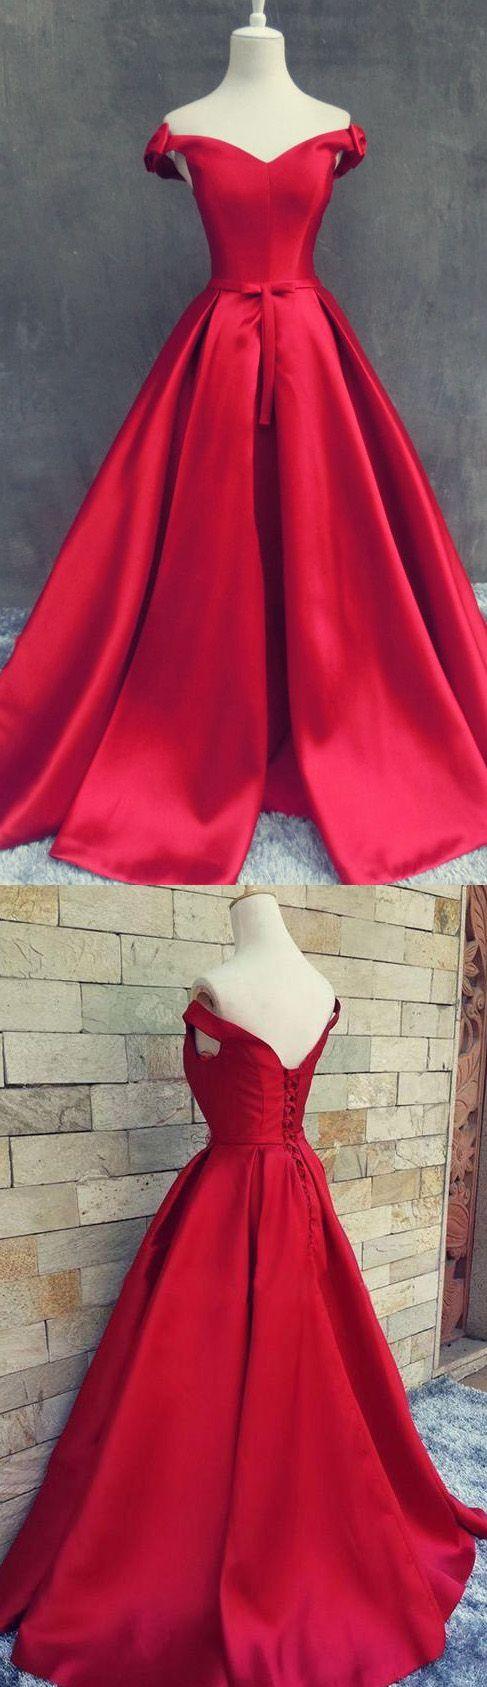 Red prom dresses cheap prom dresses prom dresses cheap long prom